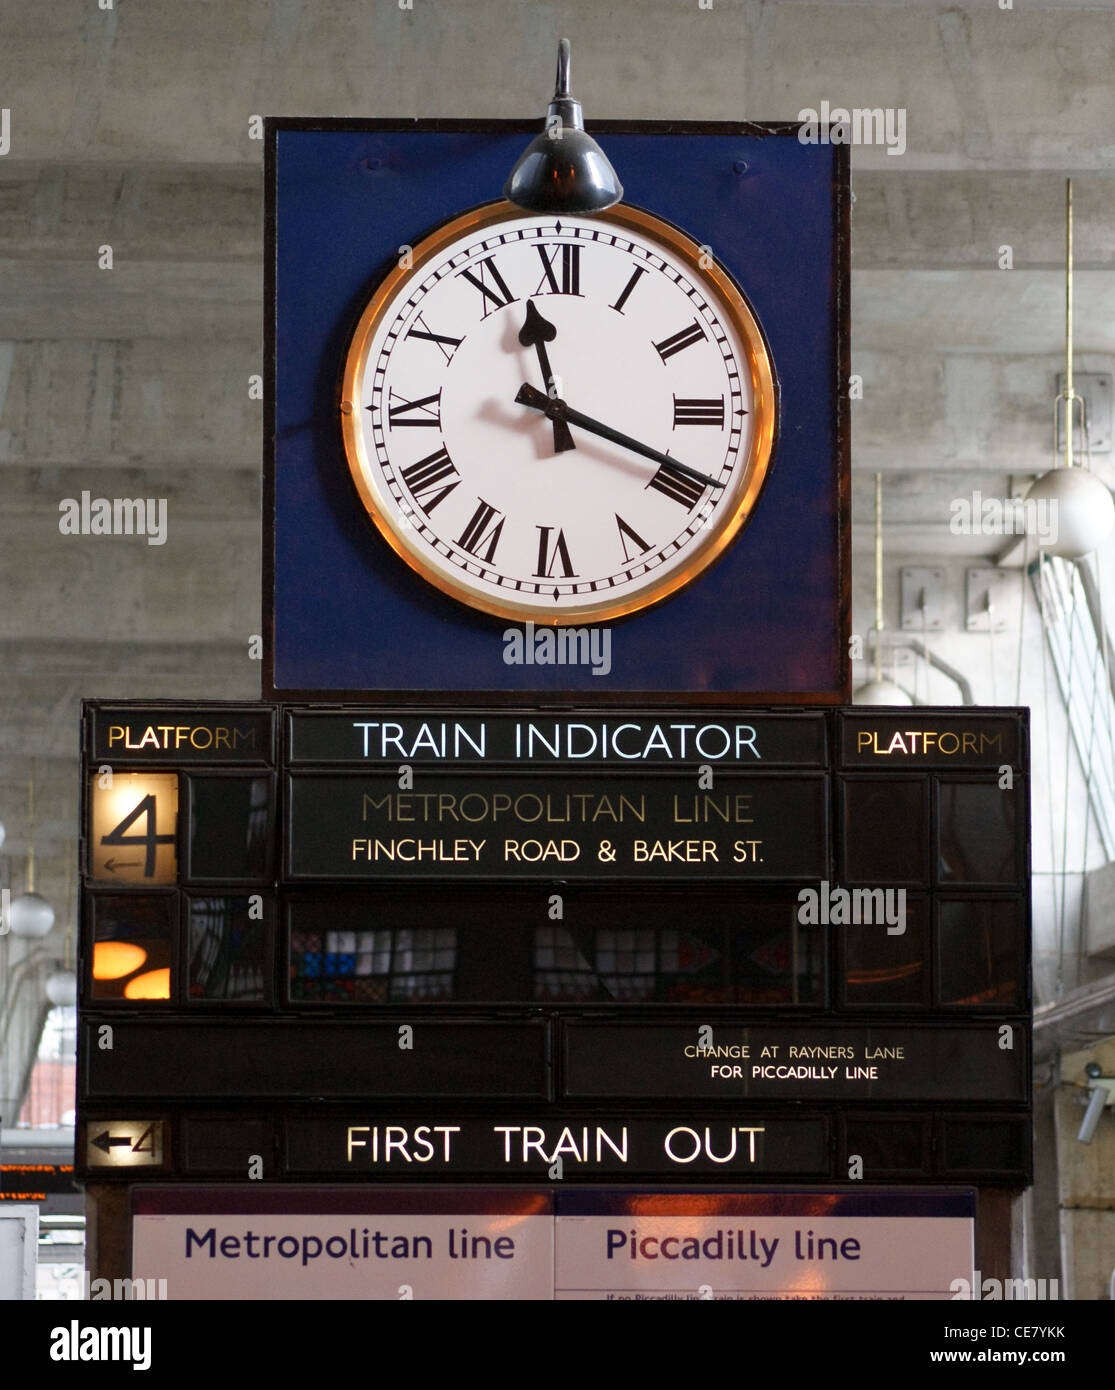 Clock and train indicator, Uxbridge Underground (Tube) station on the Metropolitan Line,  Middlesex, London, England - Stock Image